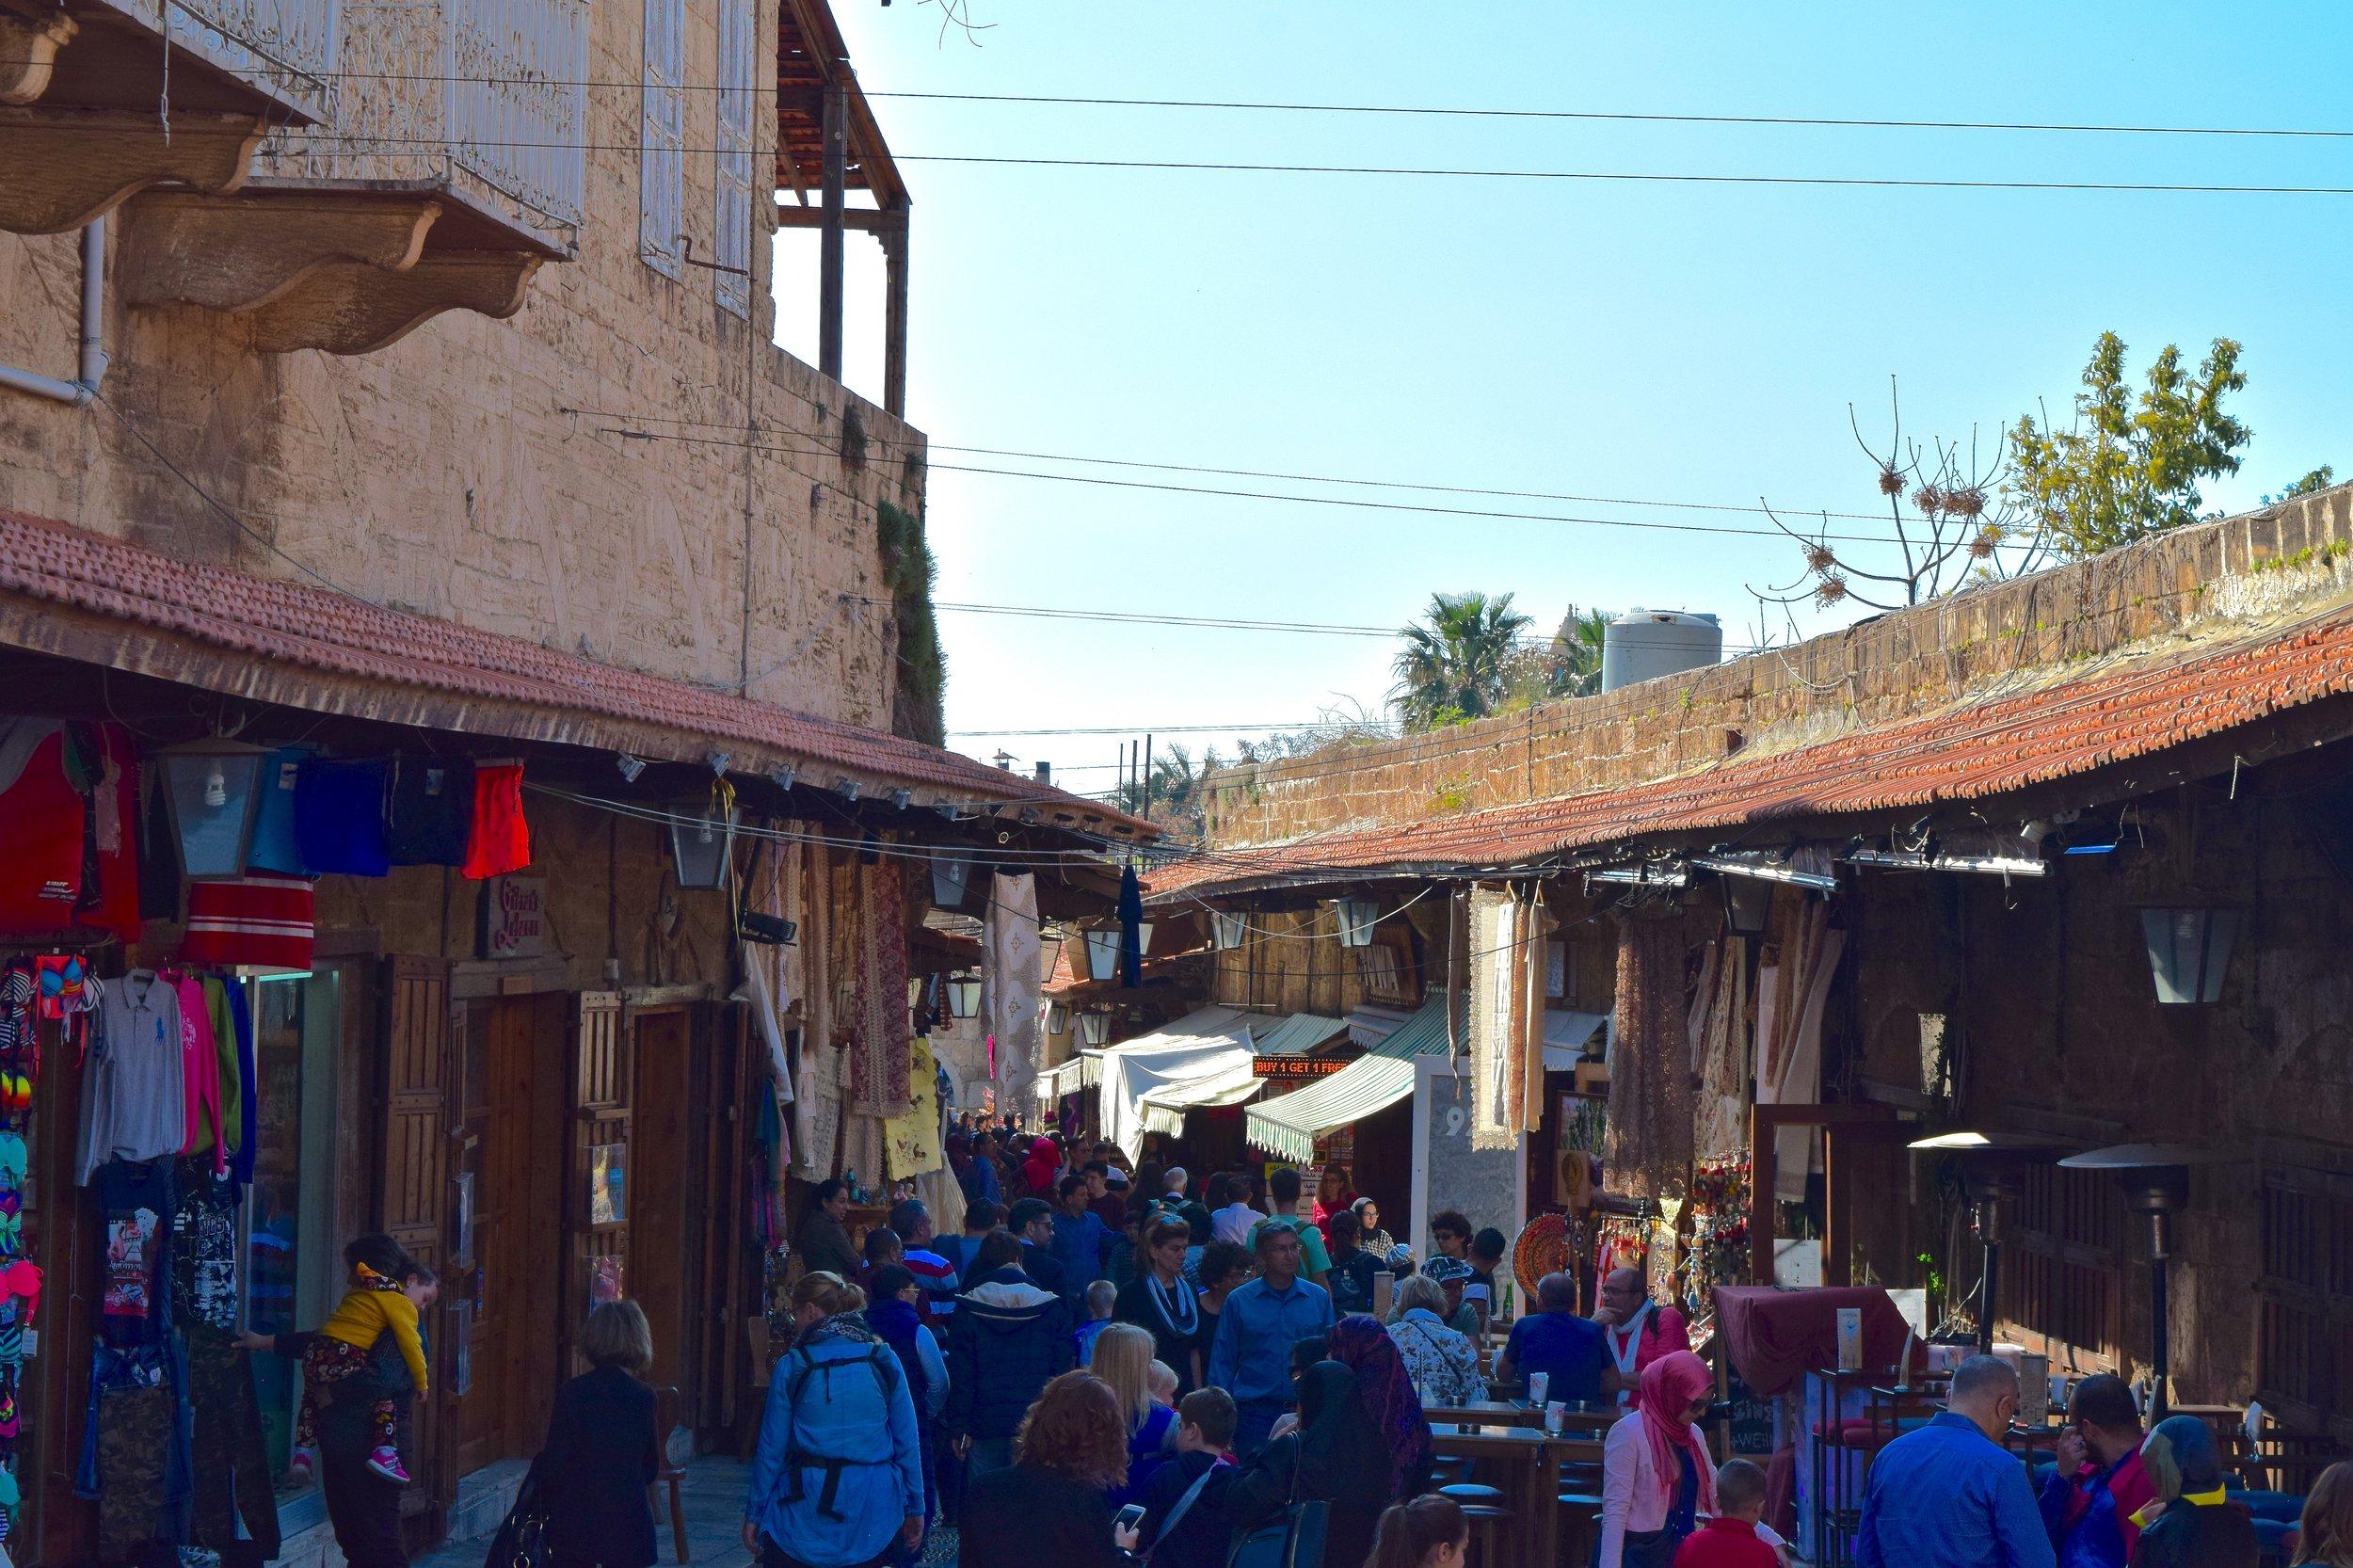 Main street of the souk